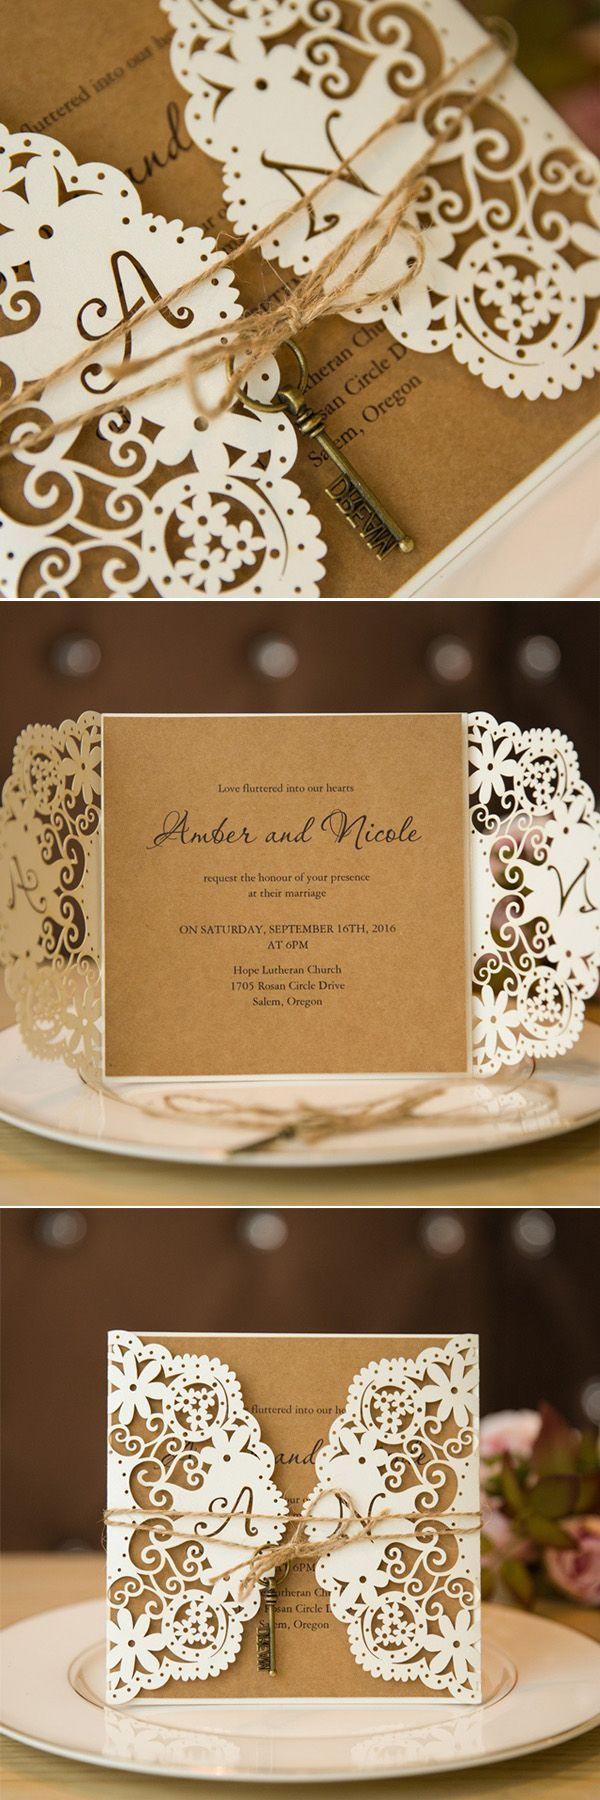 vintage doily wedding invitations%0A chic vintage laser cut wedding invitation with keys swws      stylishweddinginvitations